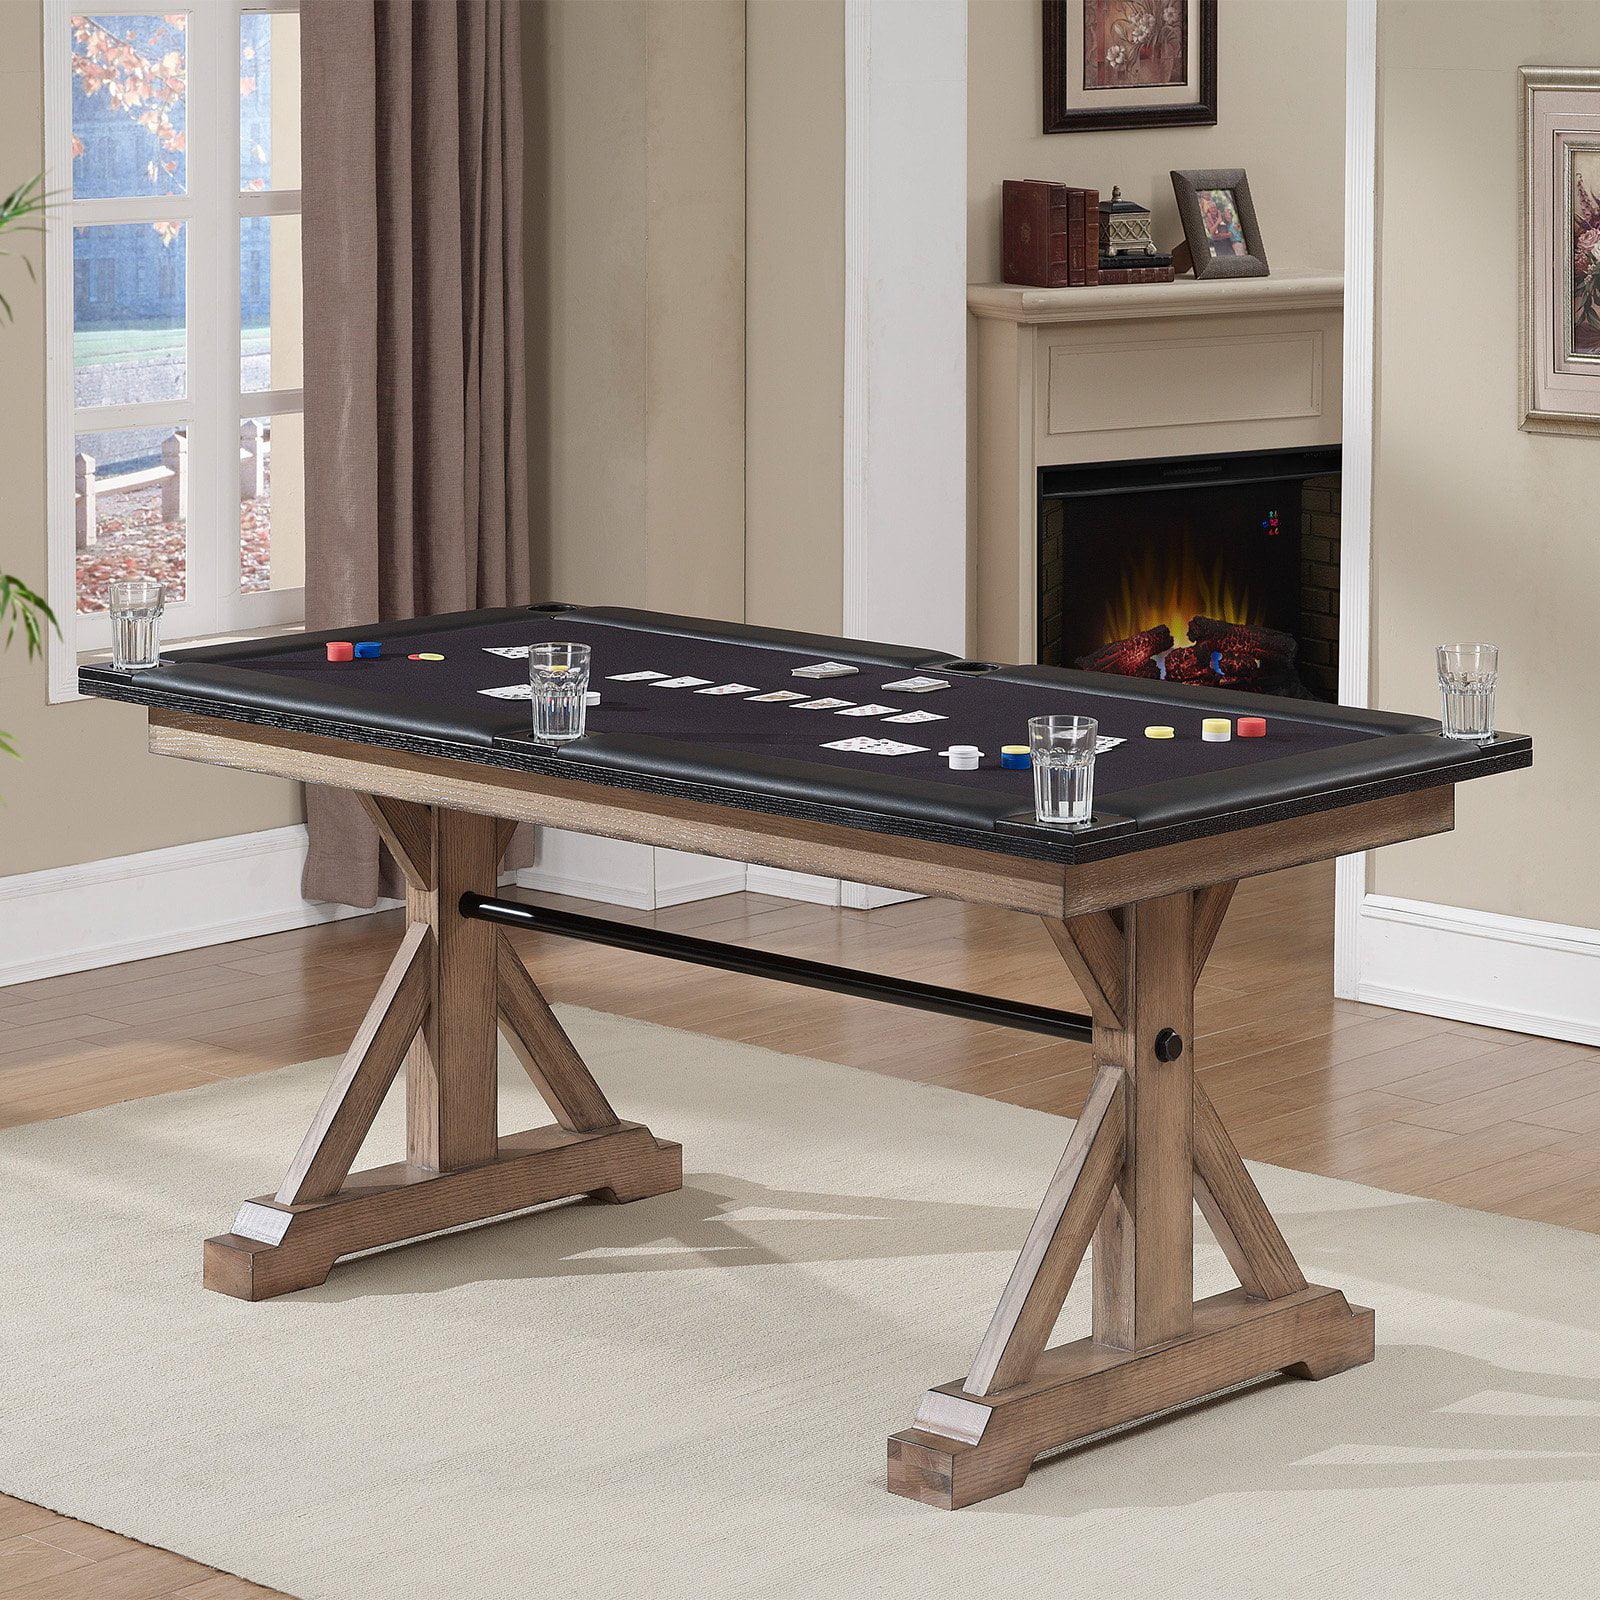 American Heritage Poker Table by American Heritage Billiards